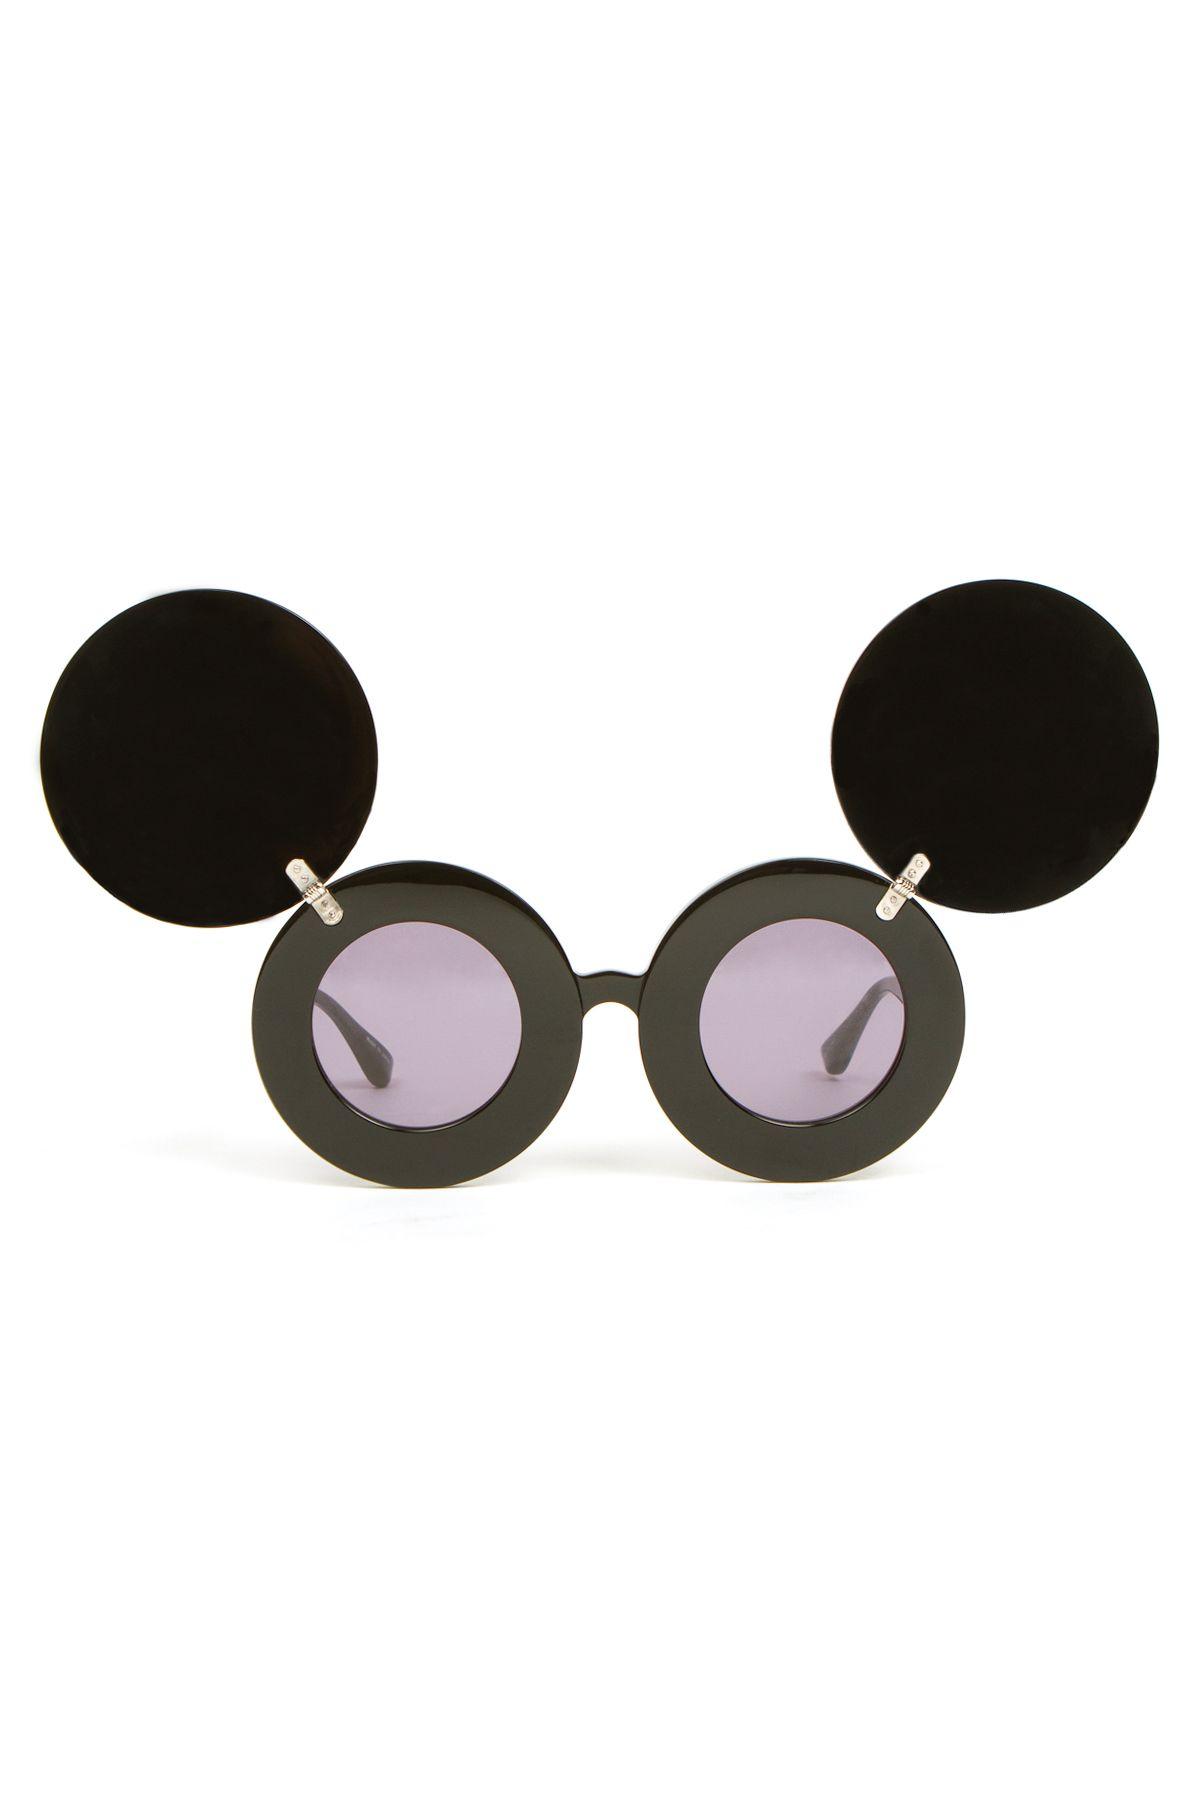 3954131a882 Linda Farrow Vintage Jeremy Scott Mickey Mouse Sunglasses